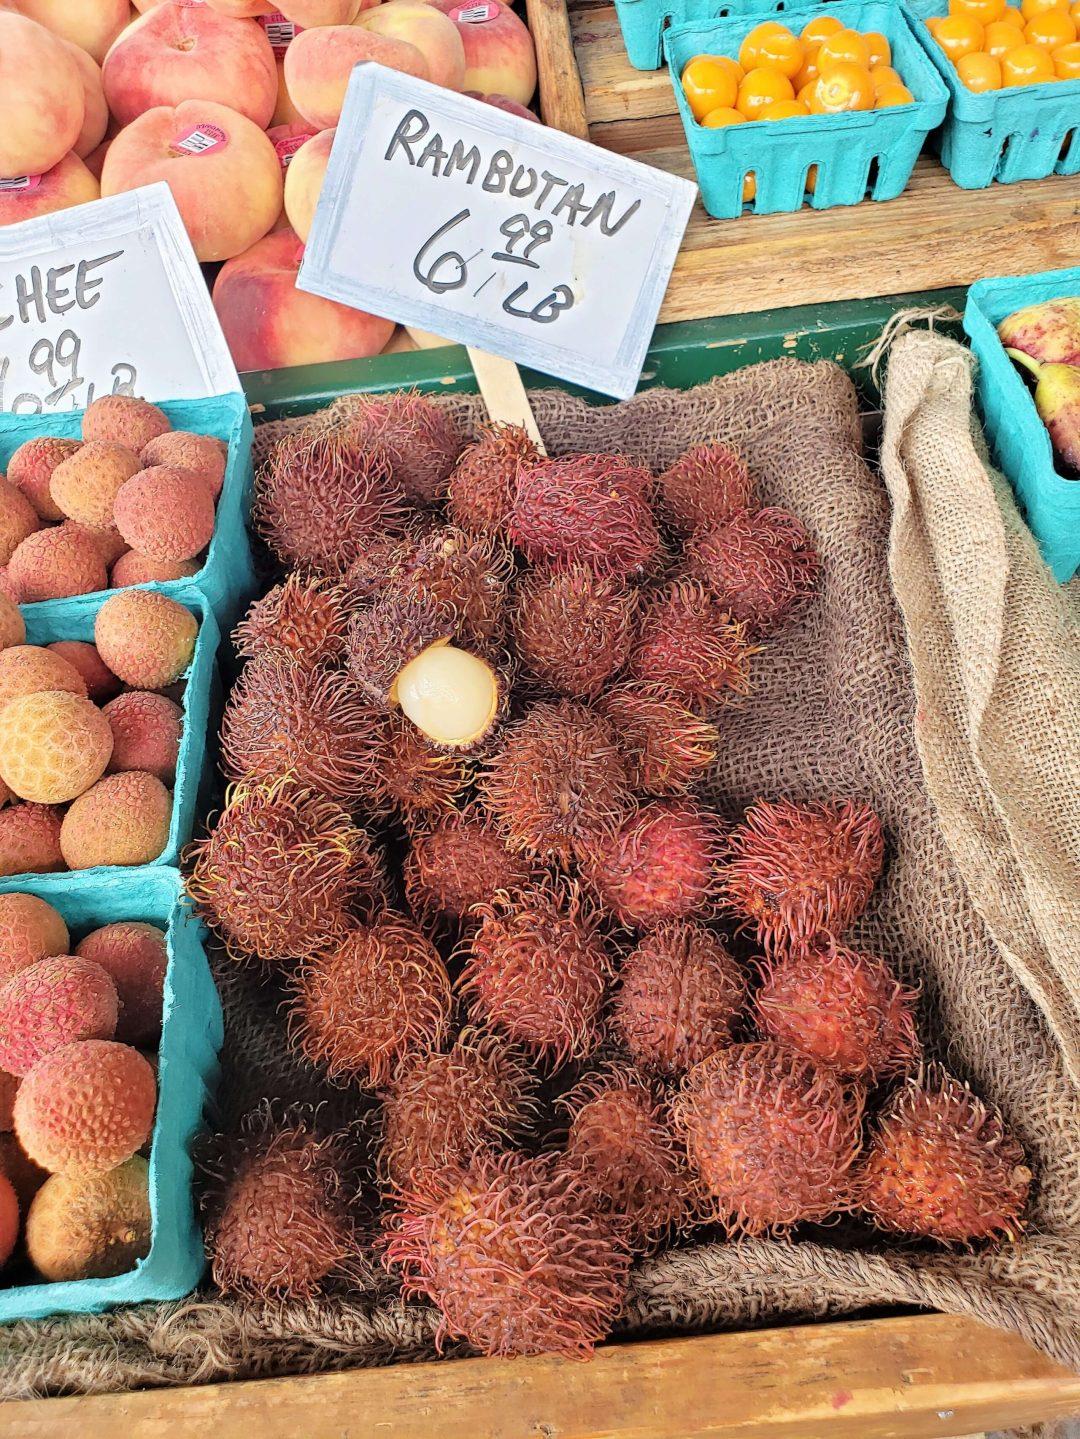 market-fruit